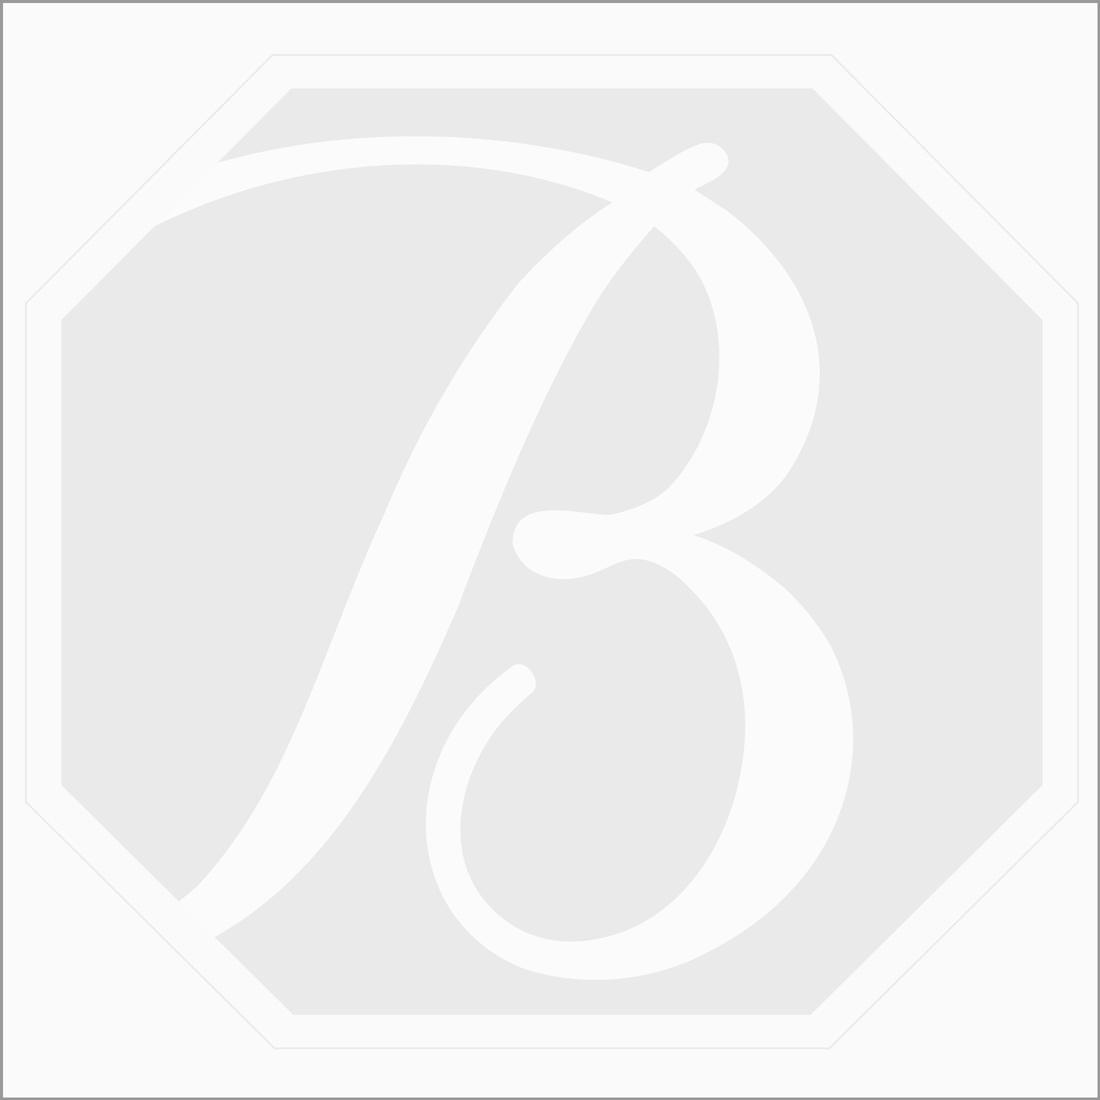 0.58 ct. Oval (I-VS2) White Rose Cut Diamond Photograph